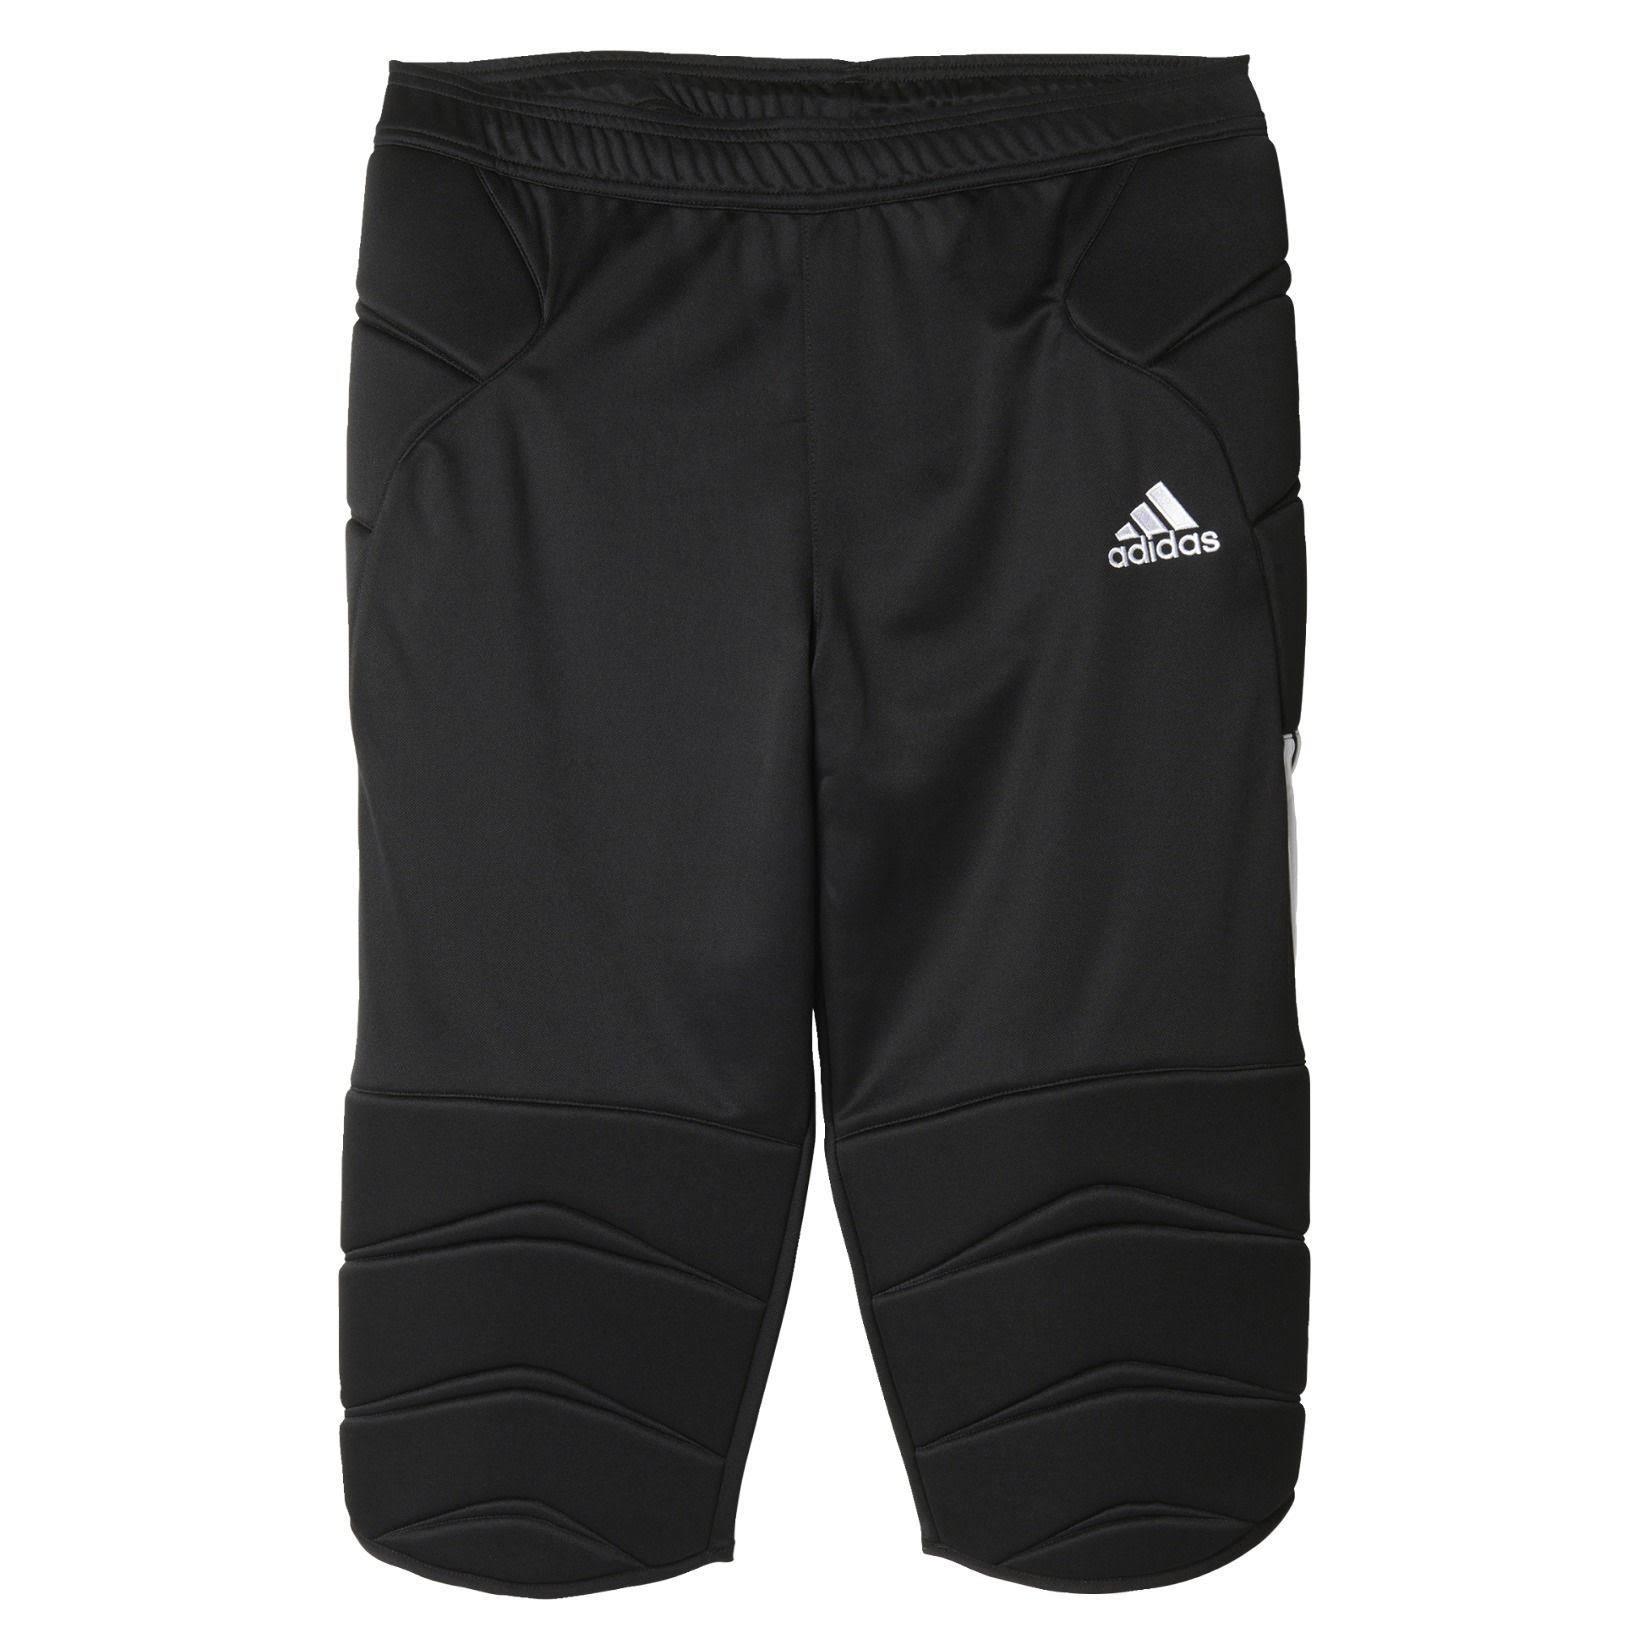 Adidas 3/4 Goalkeeper Trousers Tierro 13 Black